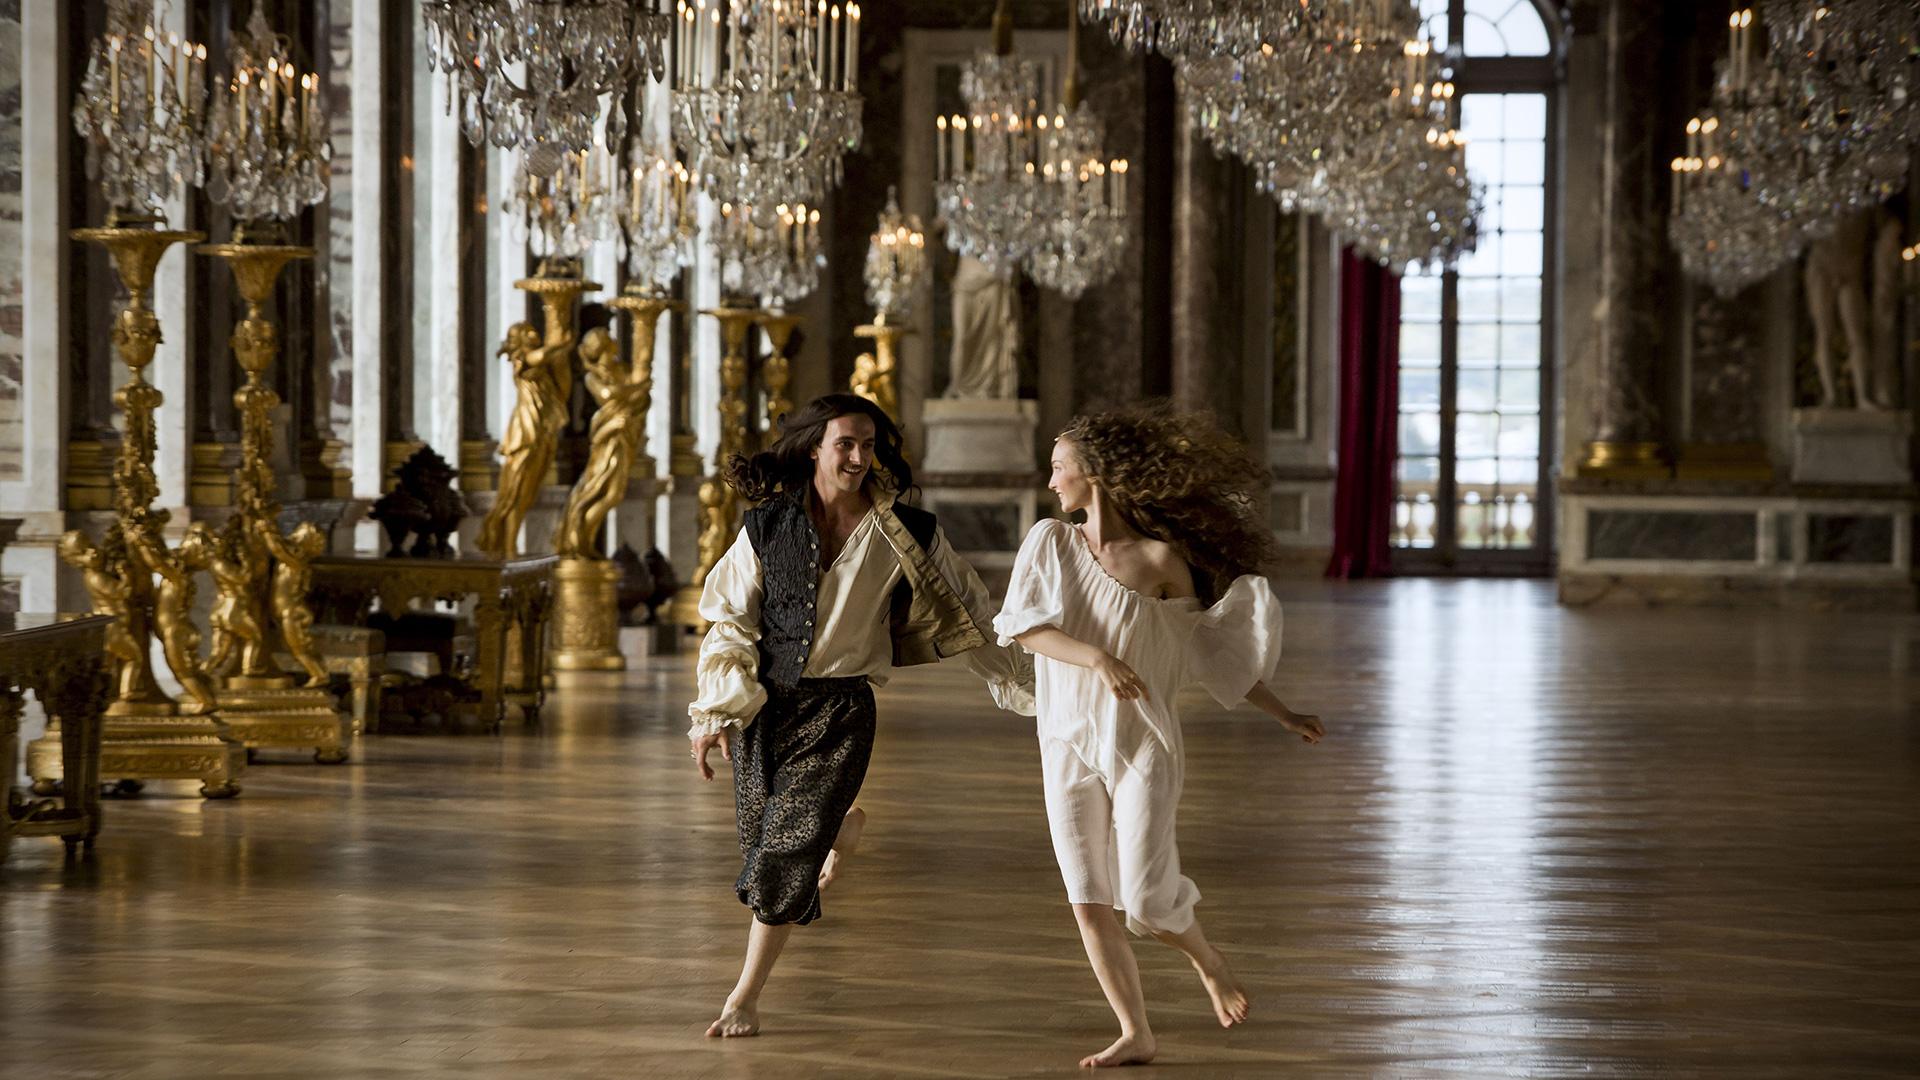 Versailles second season ordered for bbc two drama for Salon de versailles 2016